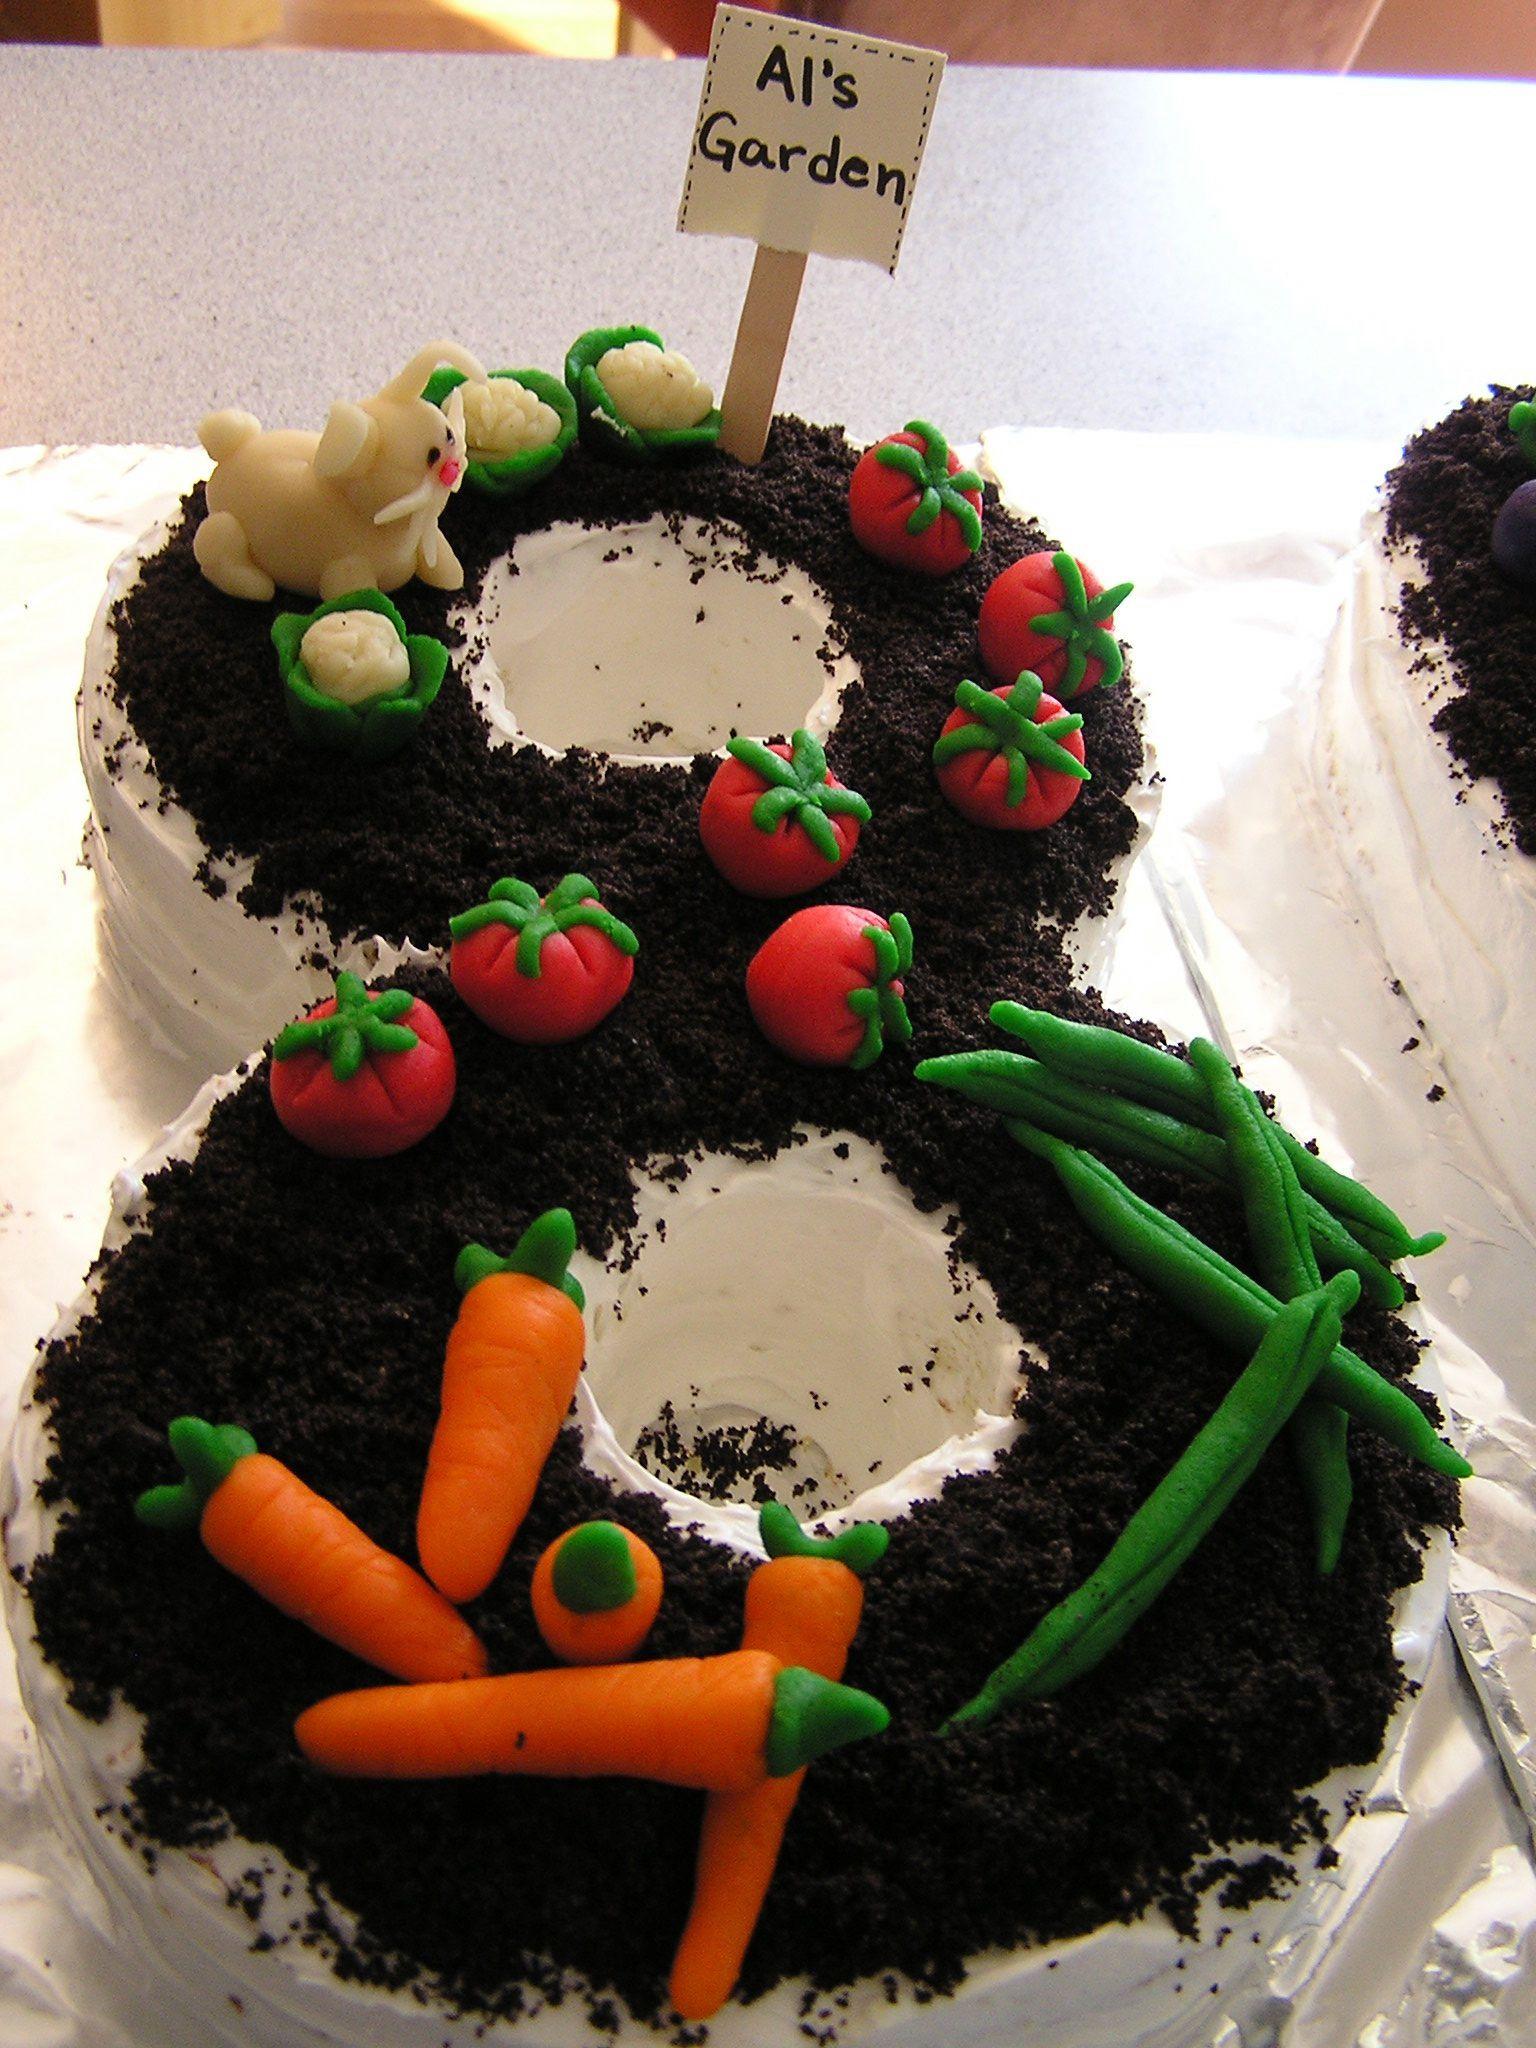 Garden Cake for Dad's 80th birthday. http://nancydamato ...